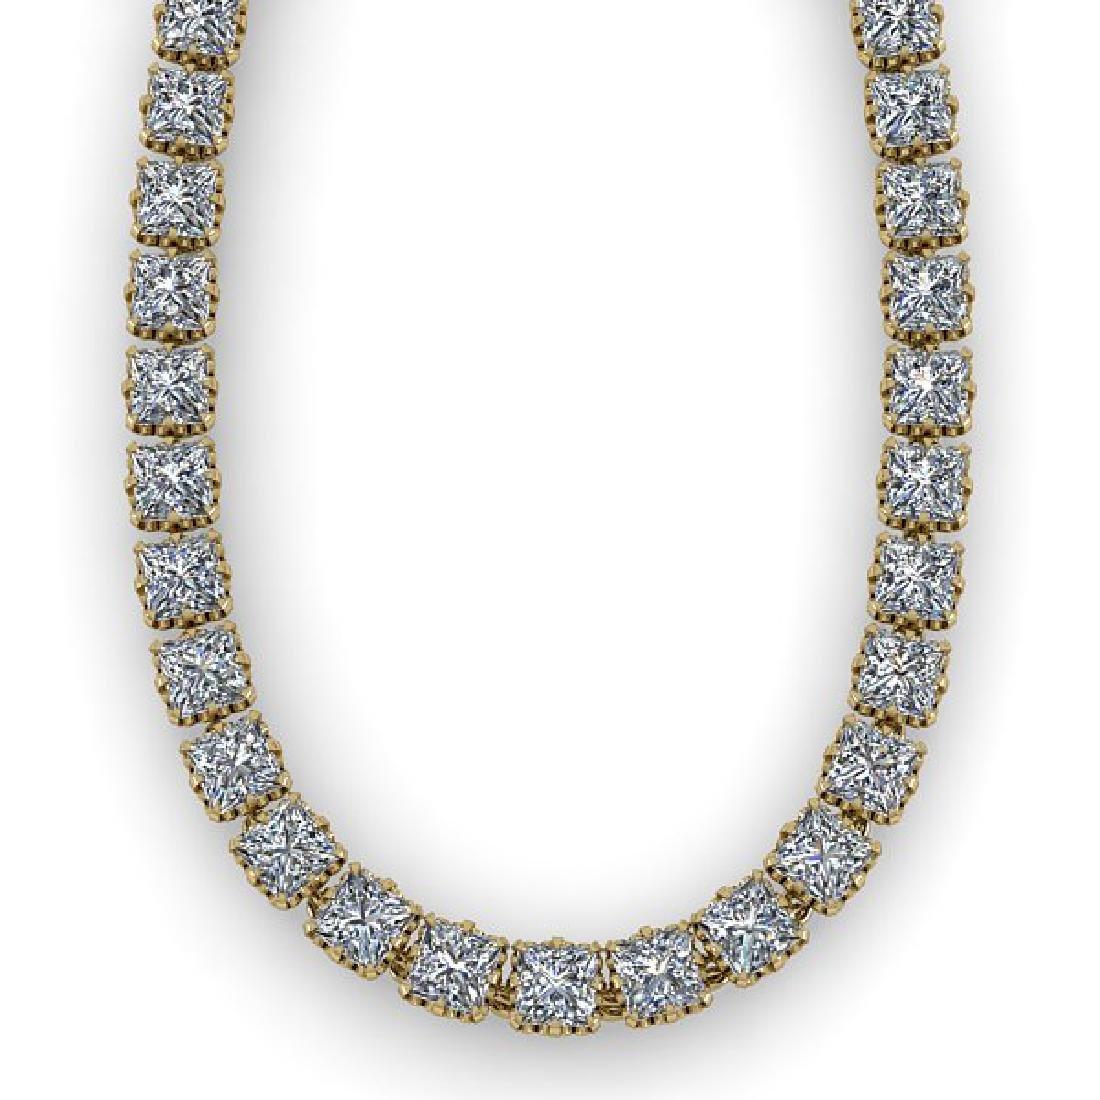 34 CTW Cushion Cut SI Certified Diamond Necklace 14K - 2